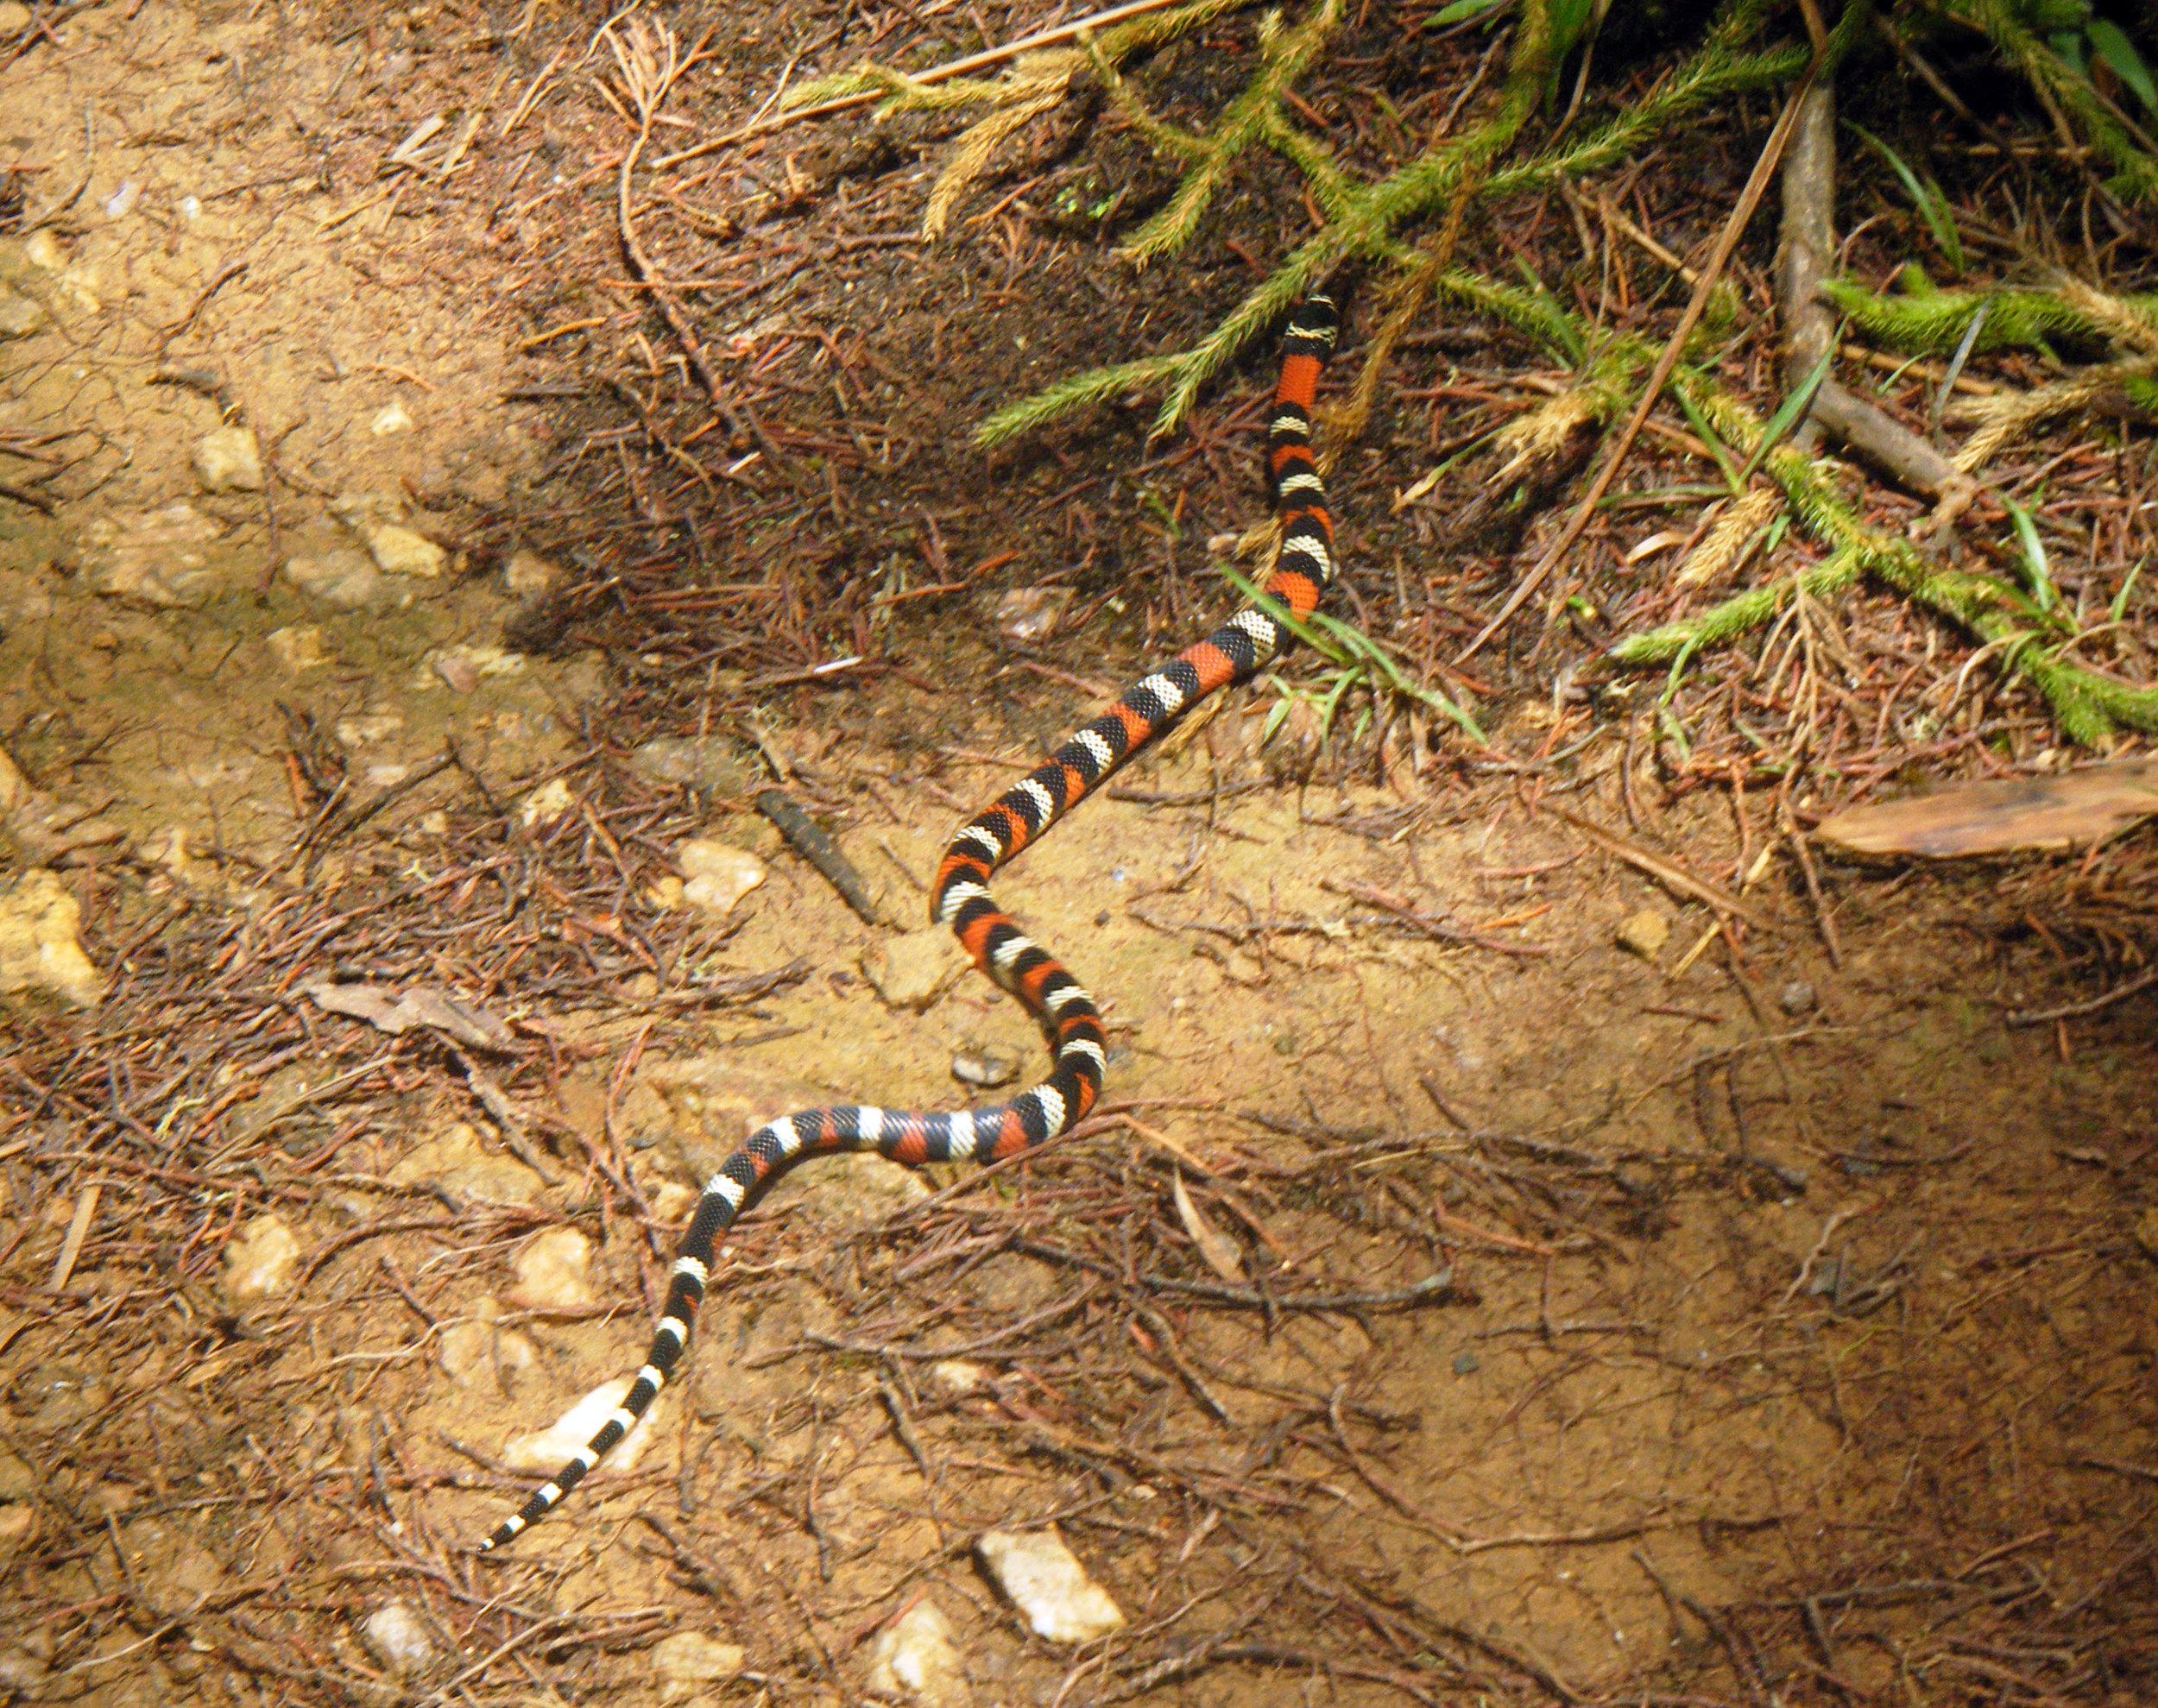 false coral snake.jpg